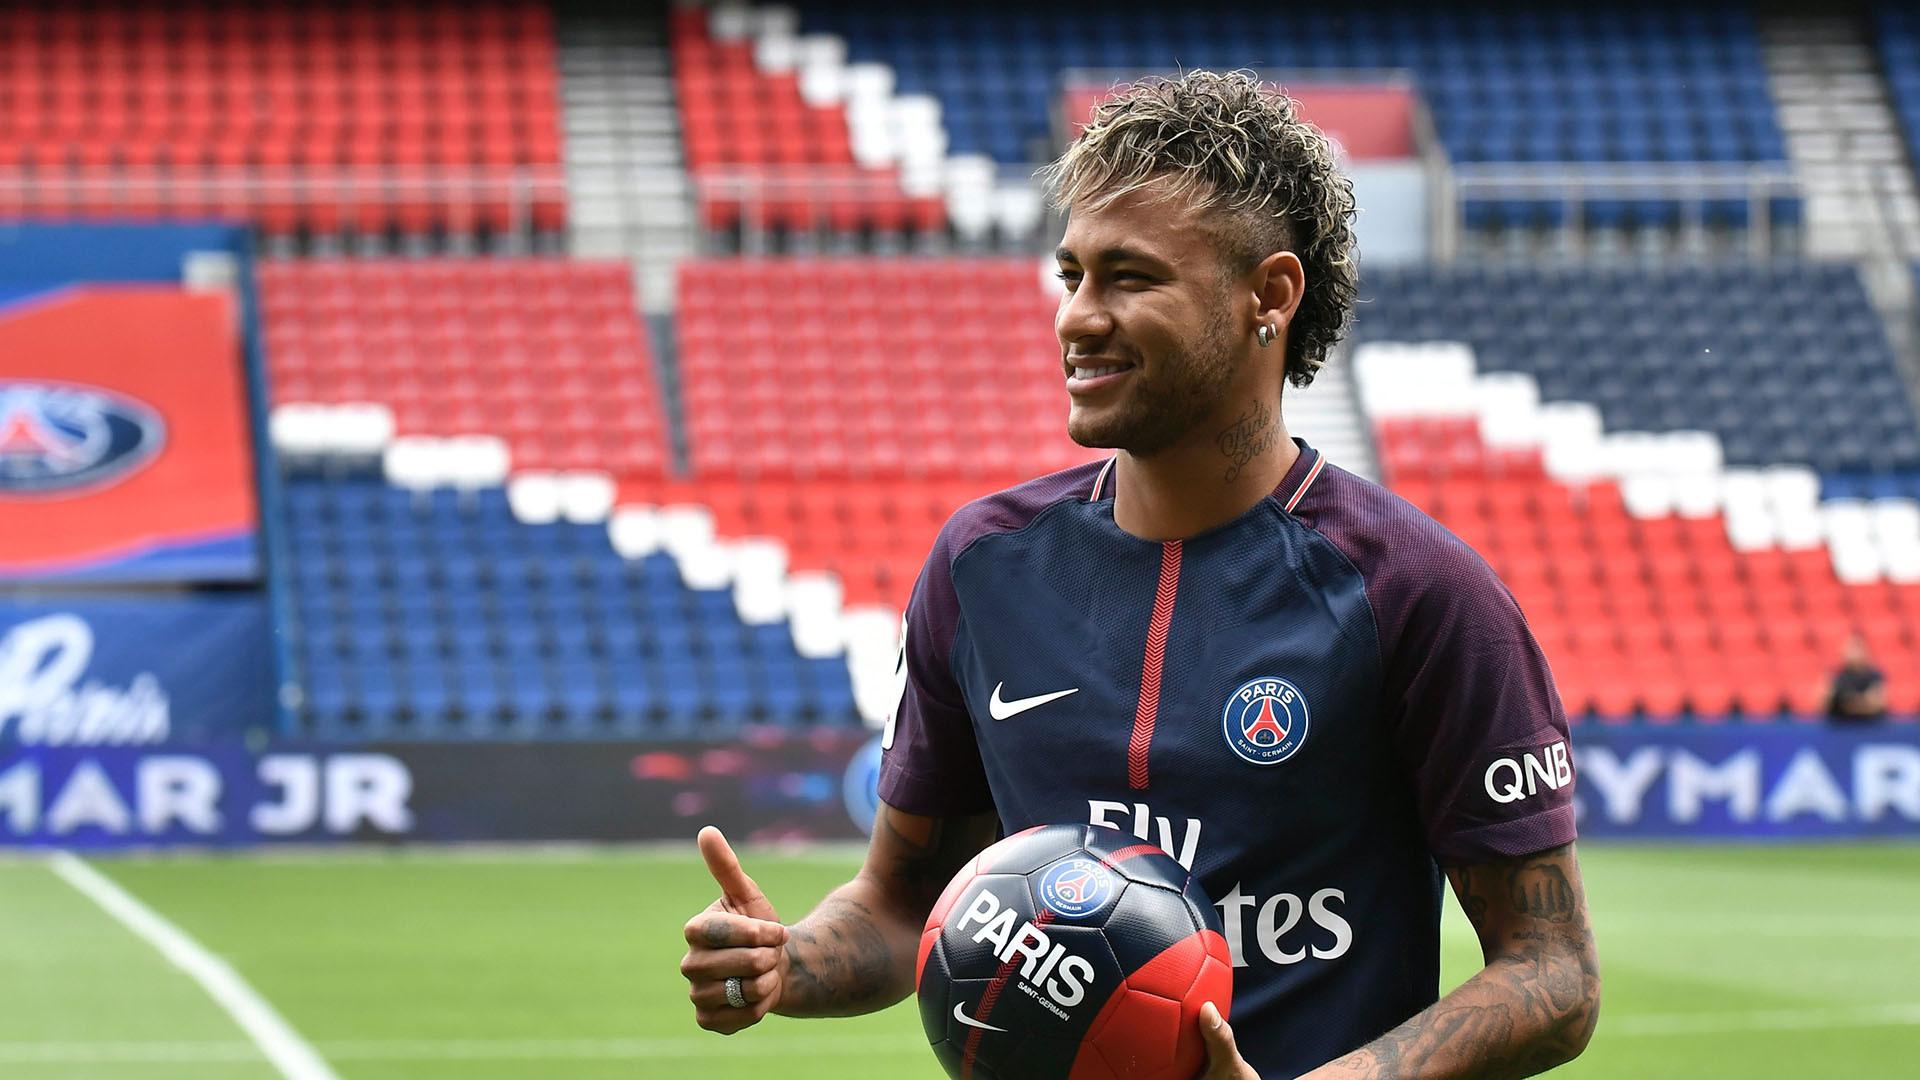 Neymar Wallpaper Hd 2018 82 Images